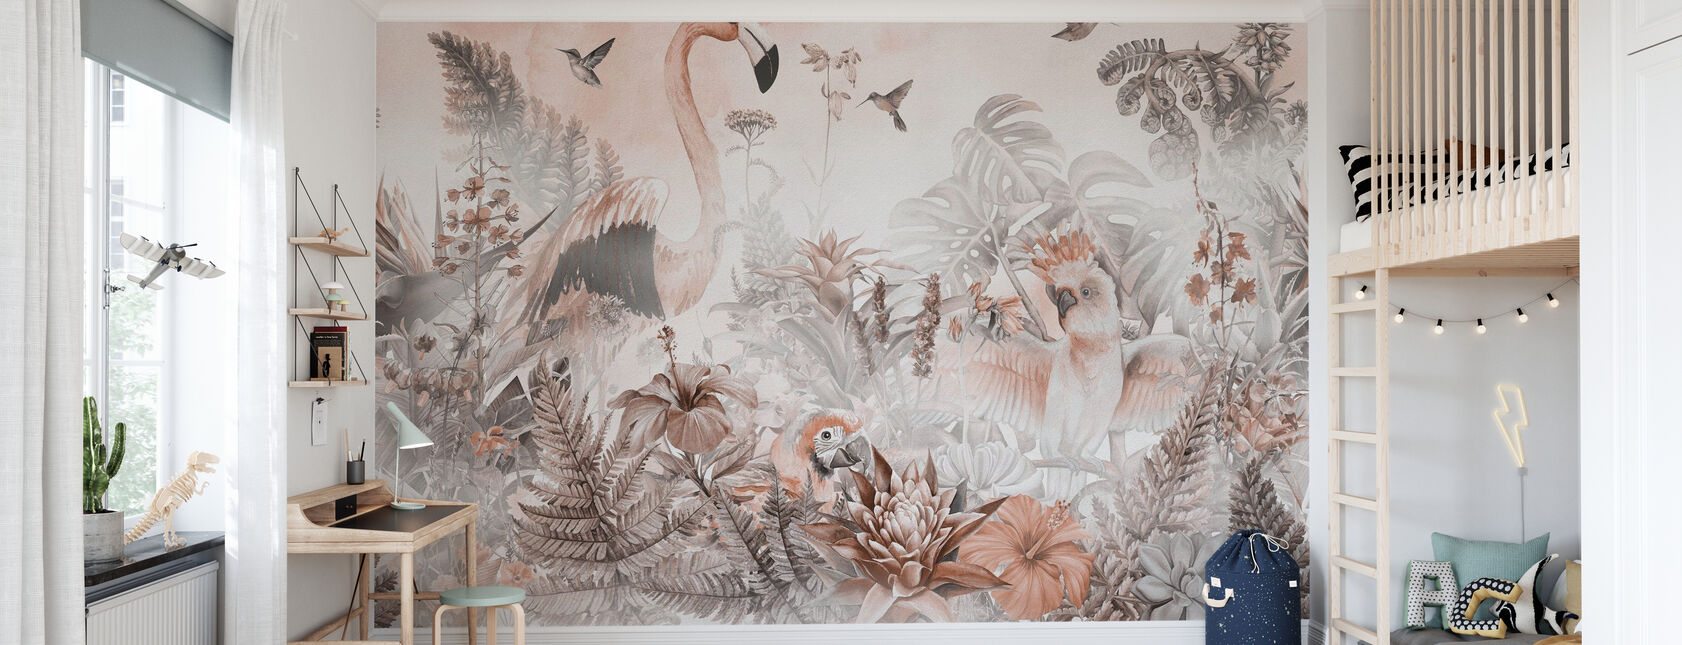 Giant Flamingo - Perzik - Behang - Kinderkamer